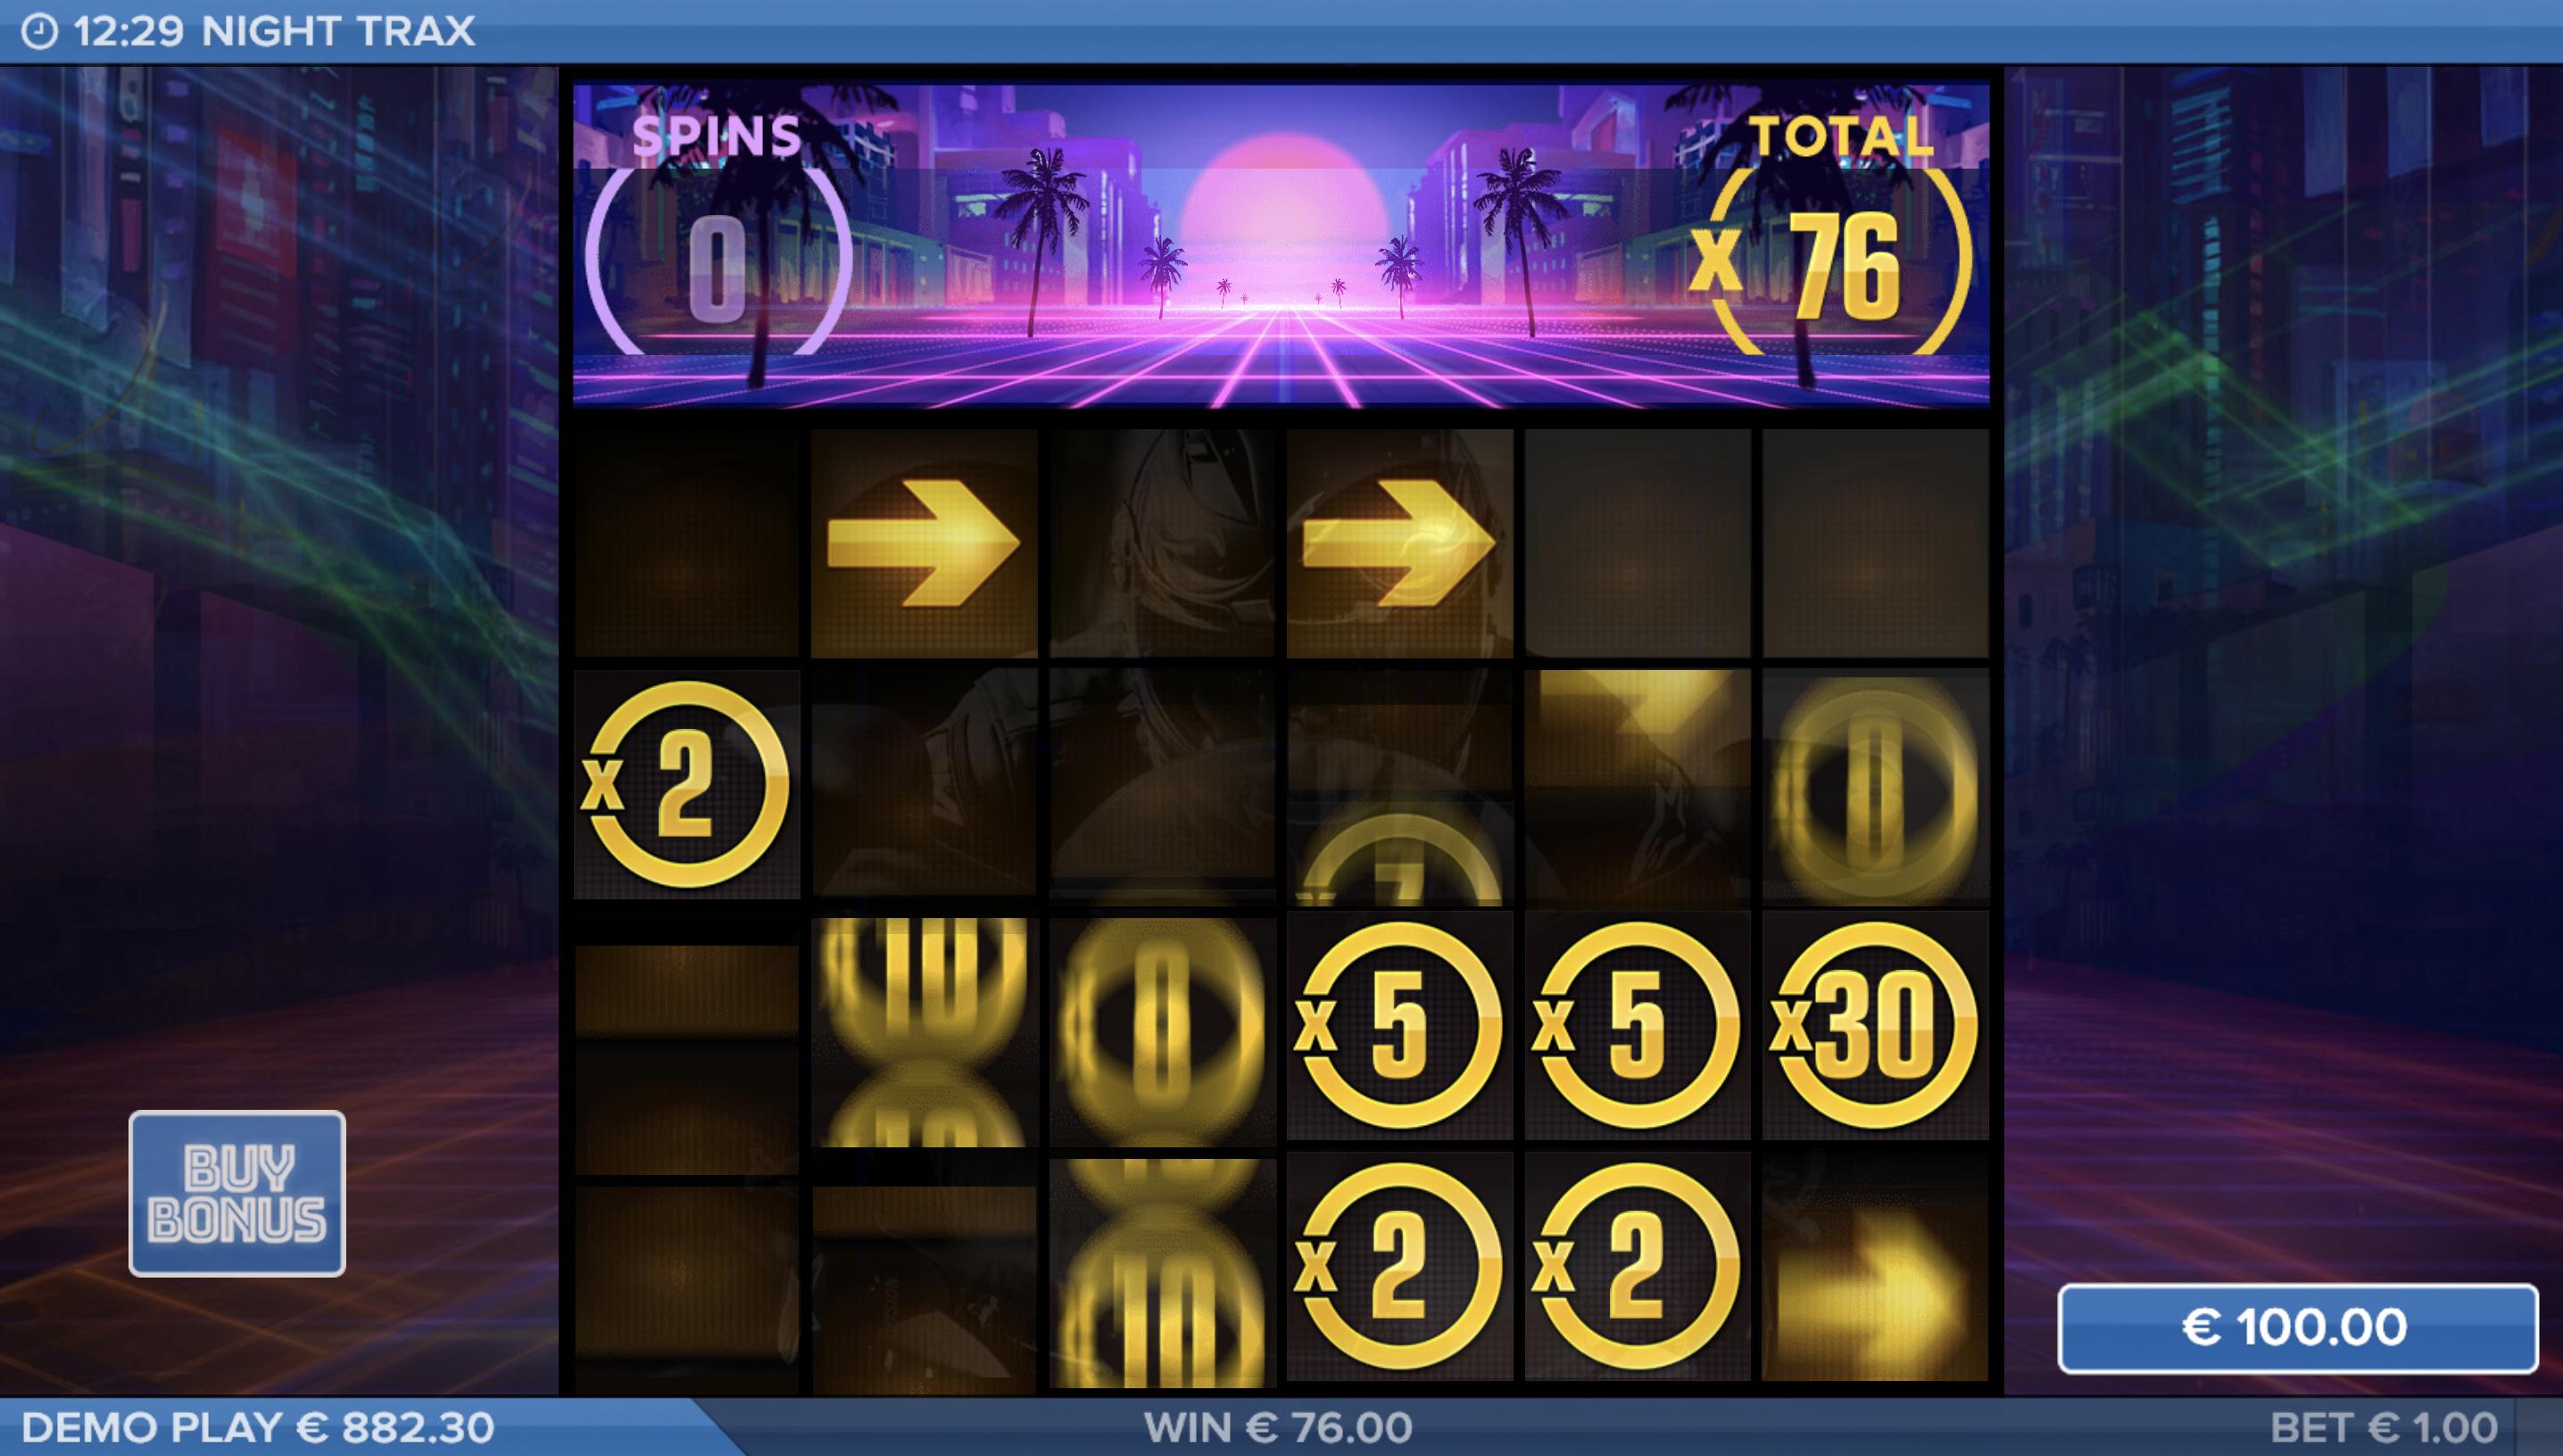 Night Trax - Bonusspel screenshot